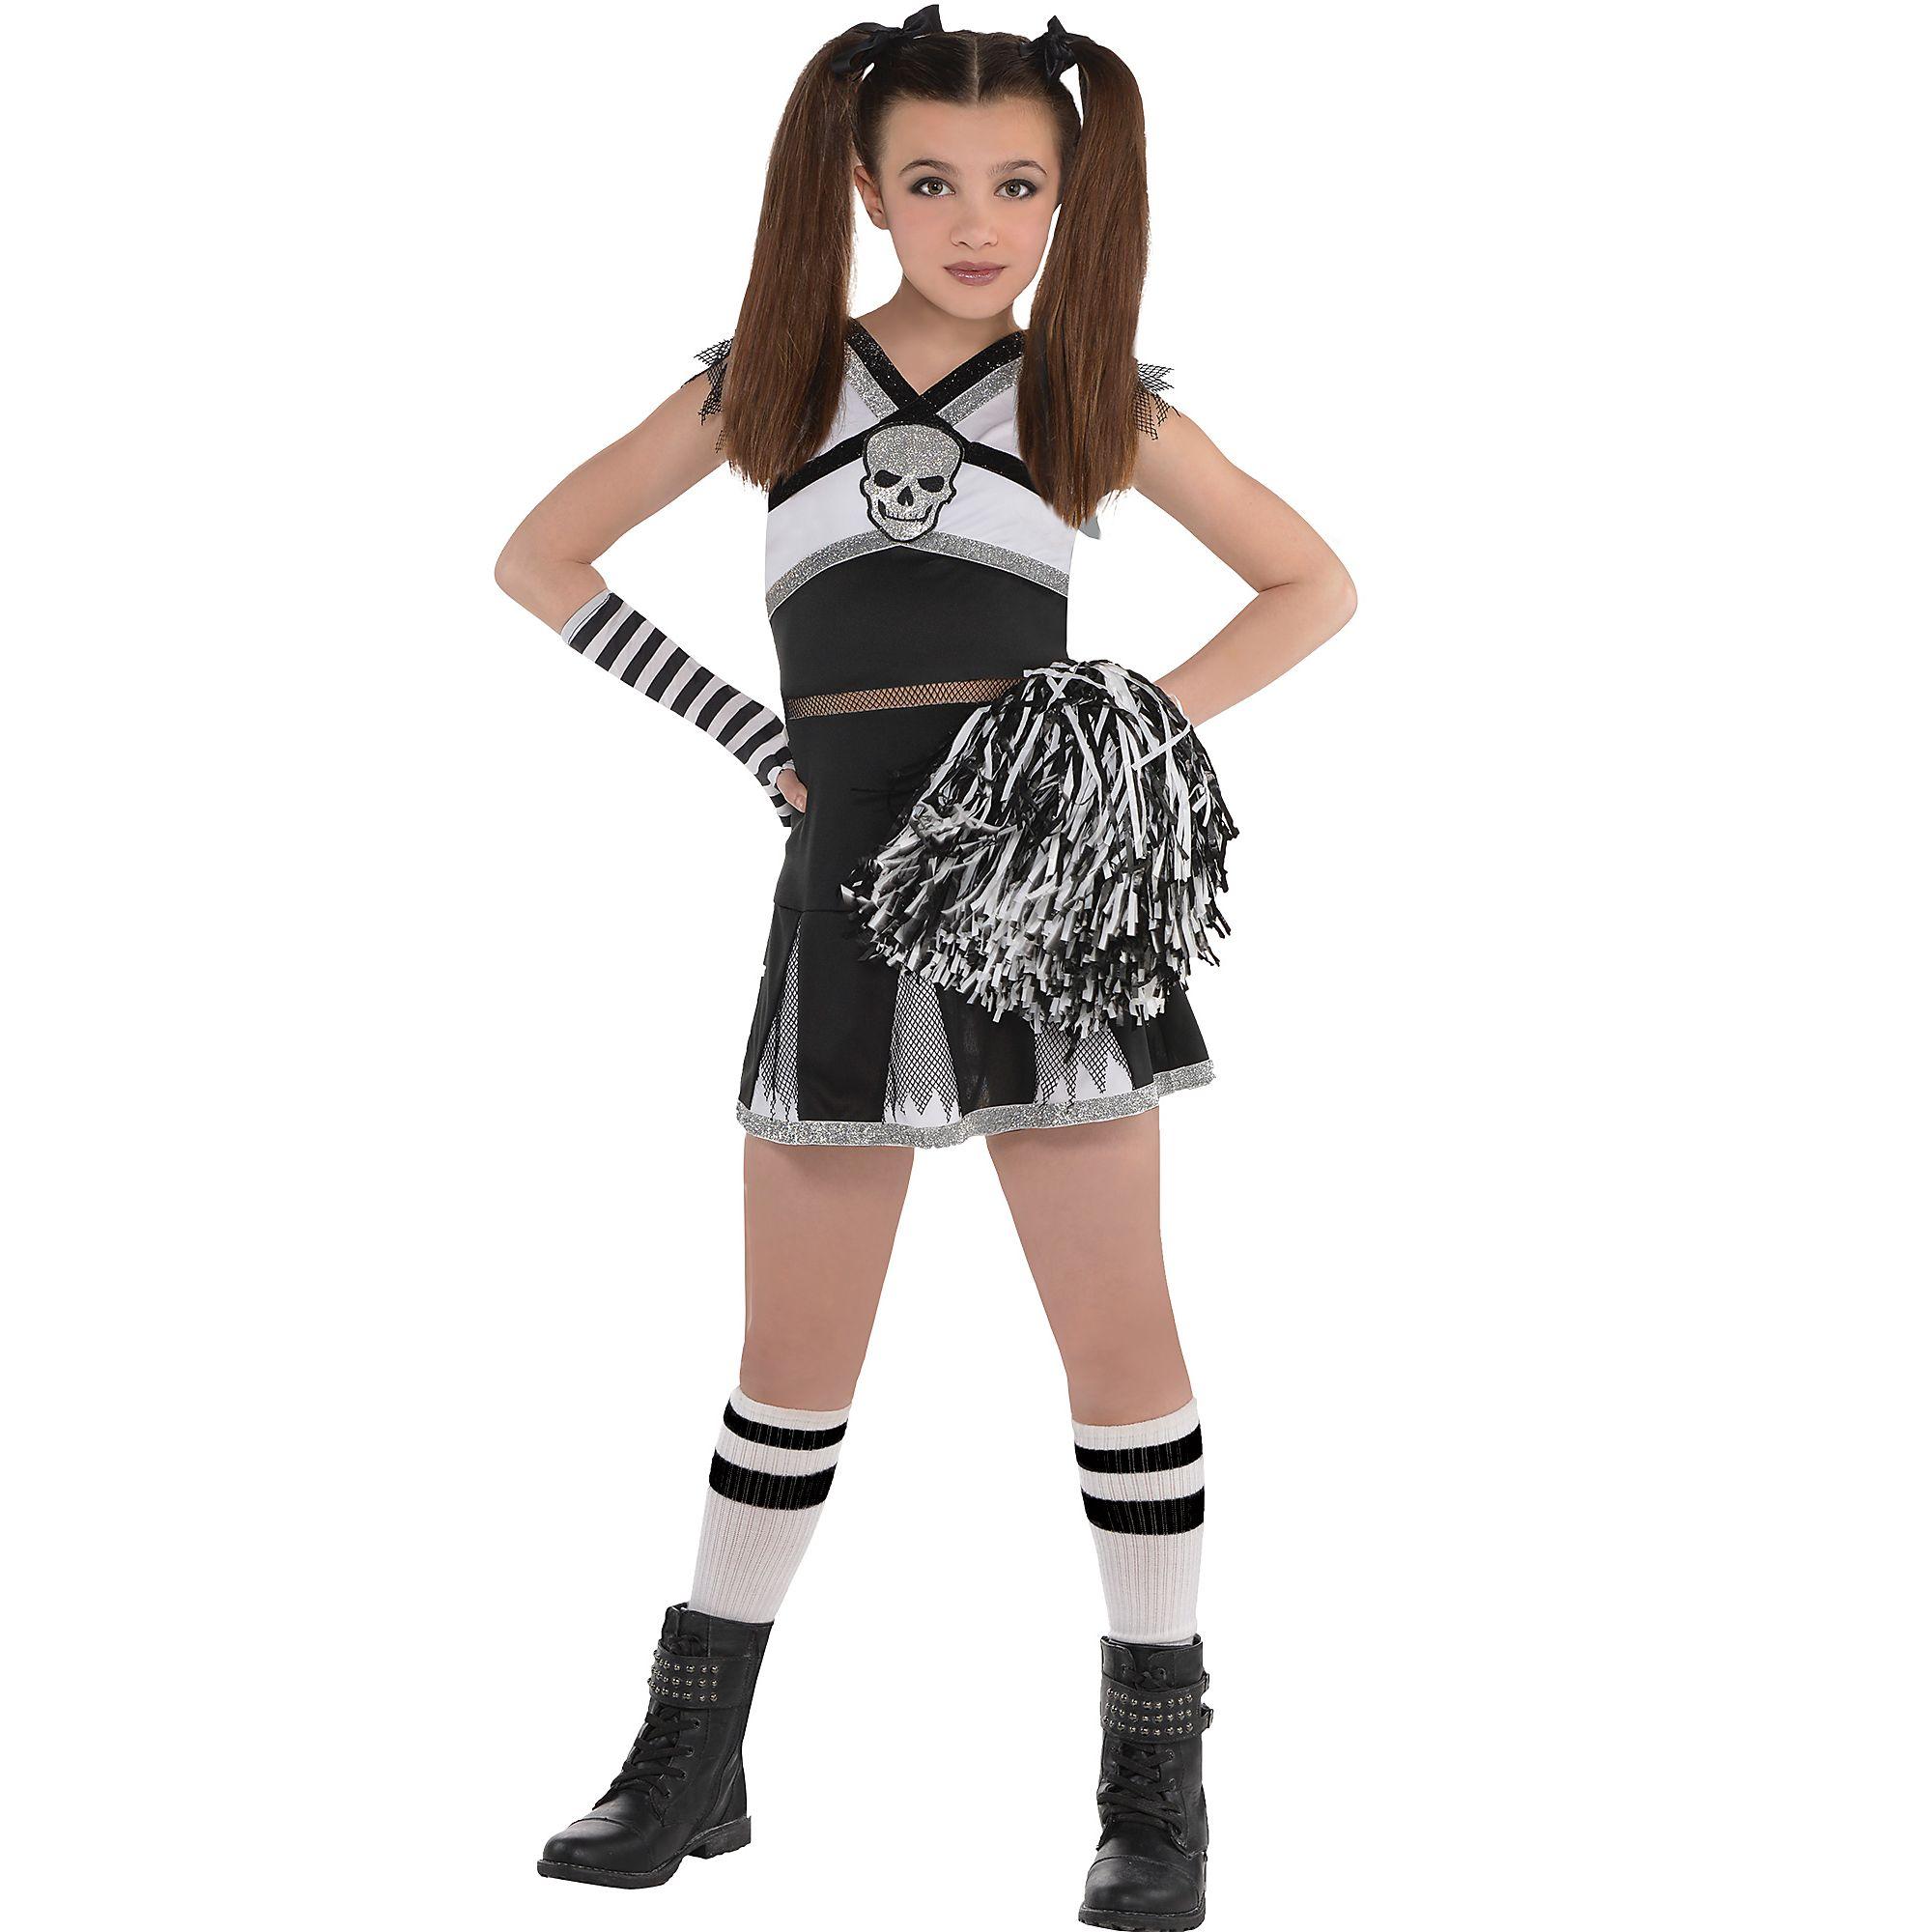 Amscan Rah Rah Rebel Cheerleader Halloween Costume For Girls Includes Arm Ebay